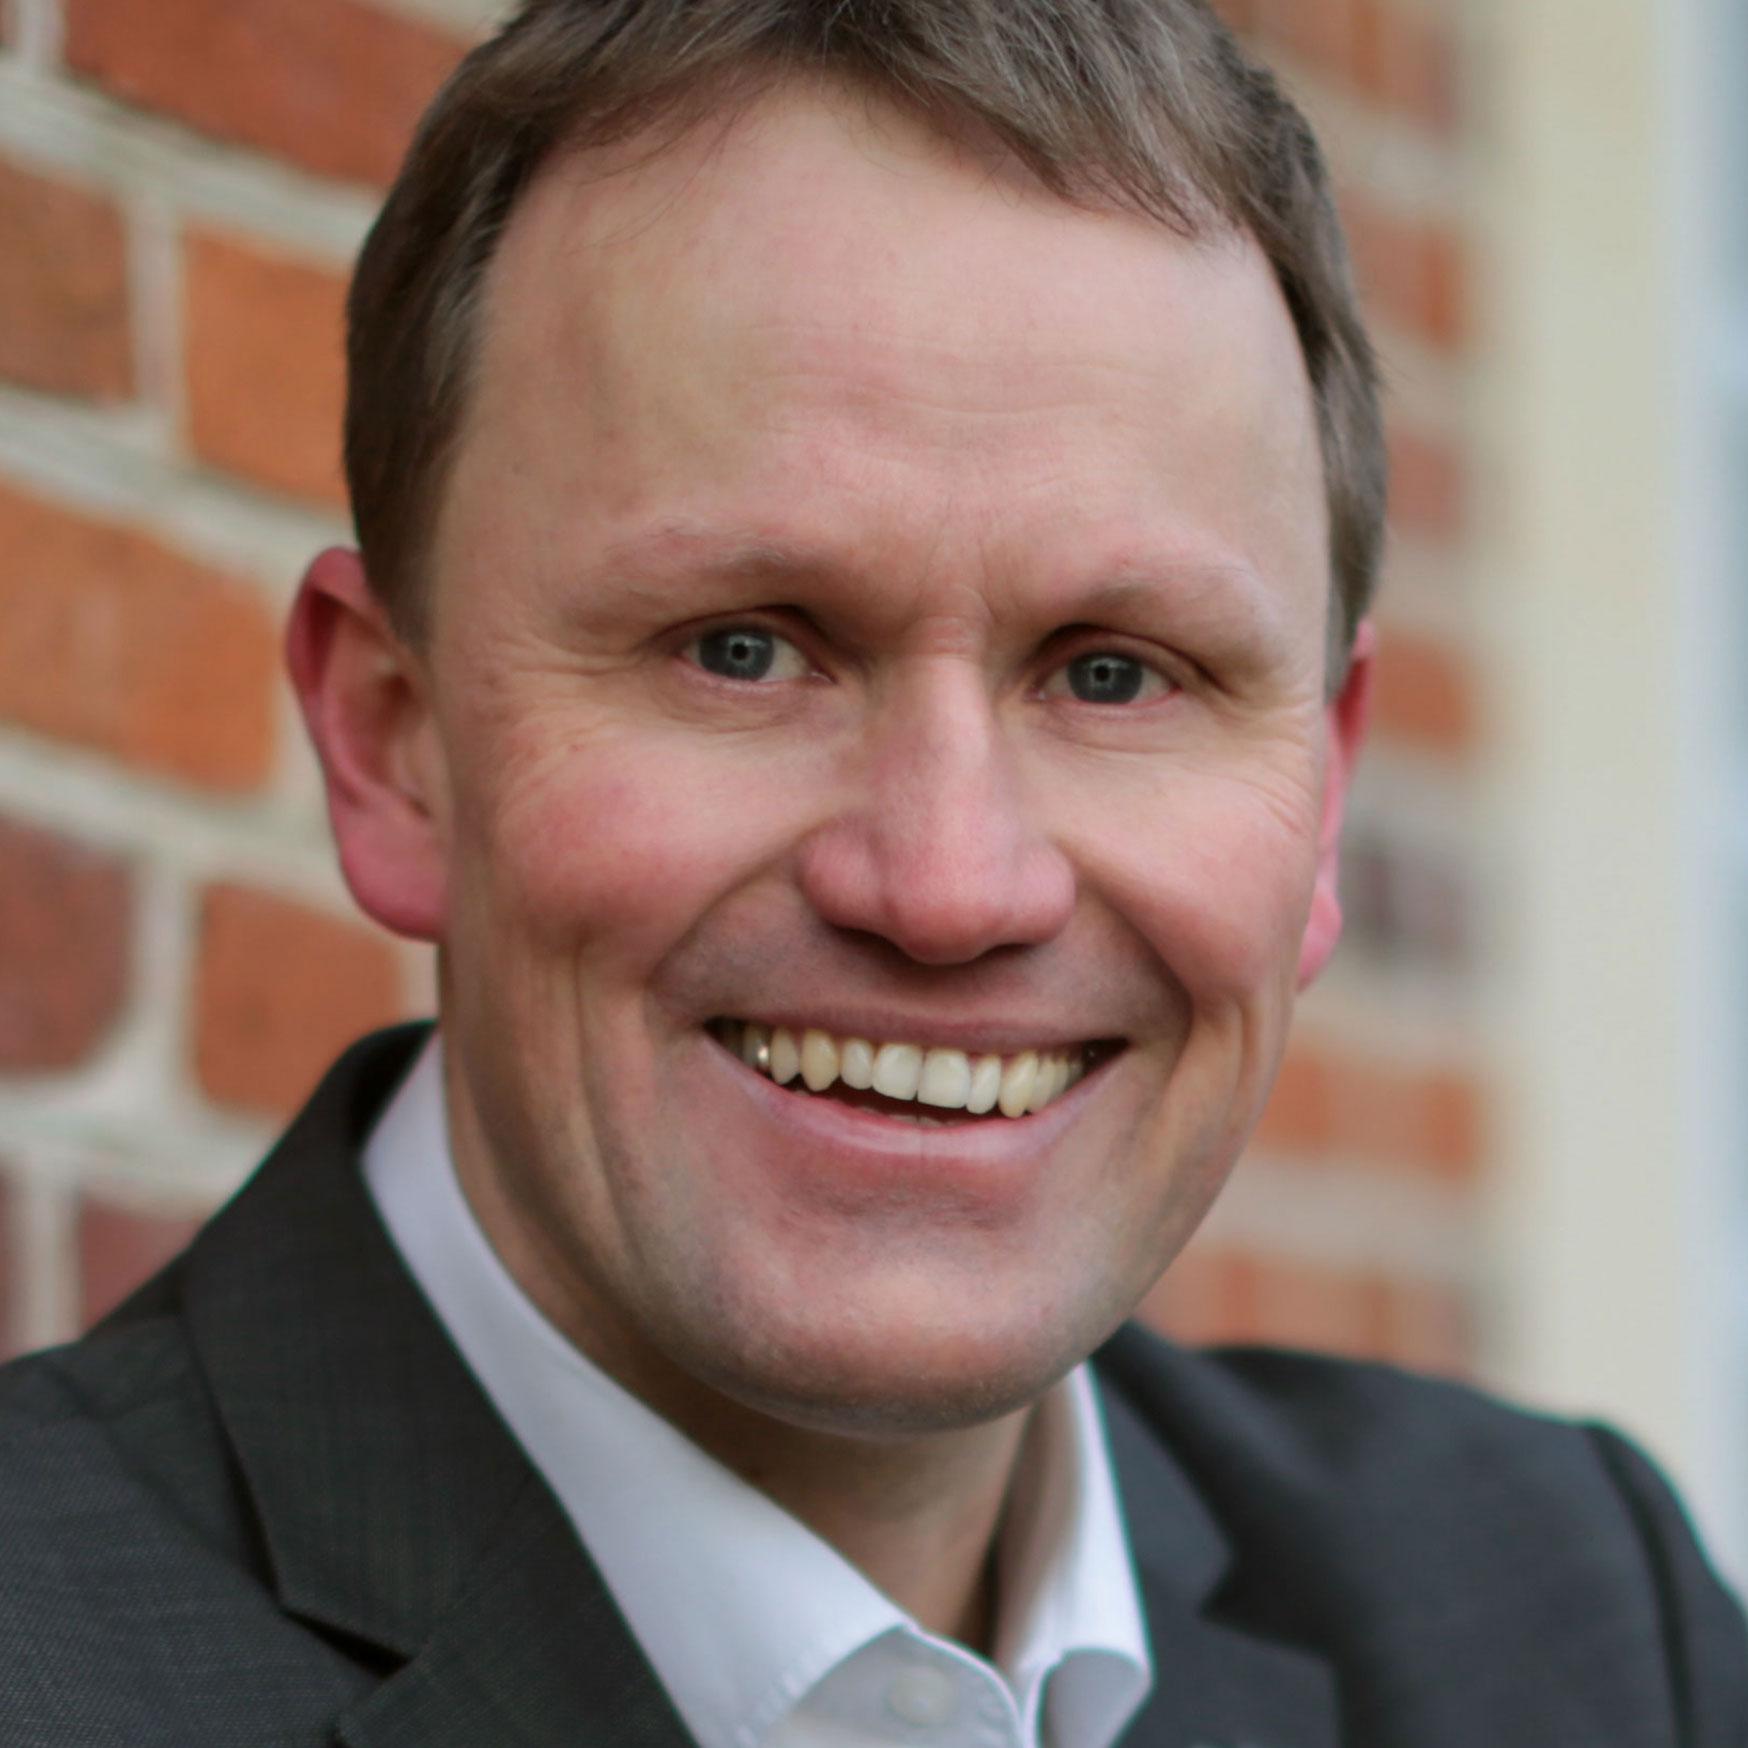 (c) Jens Gieseke